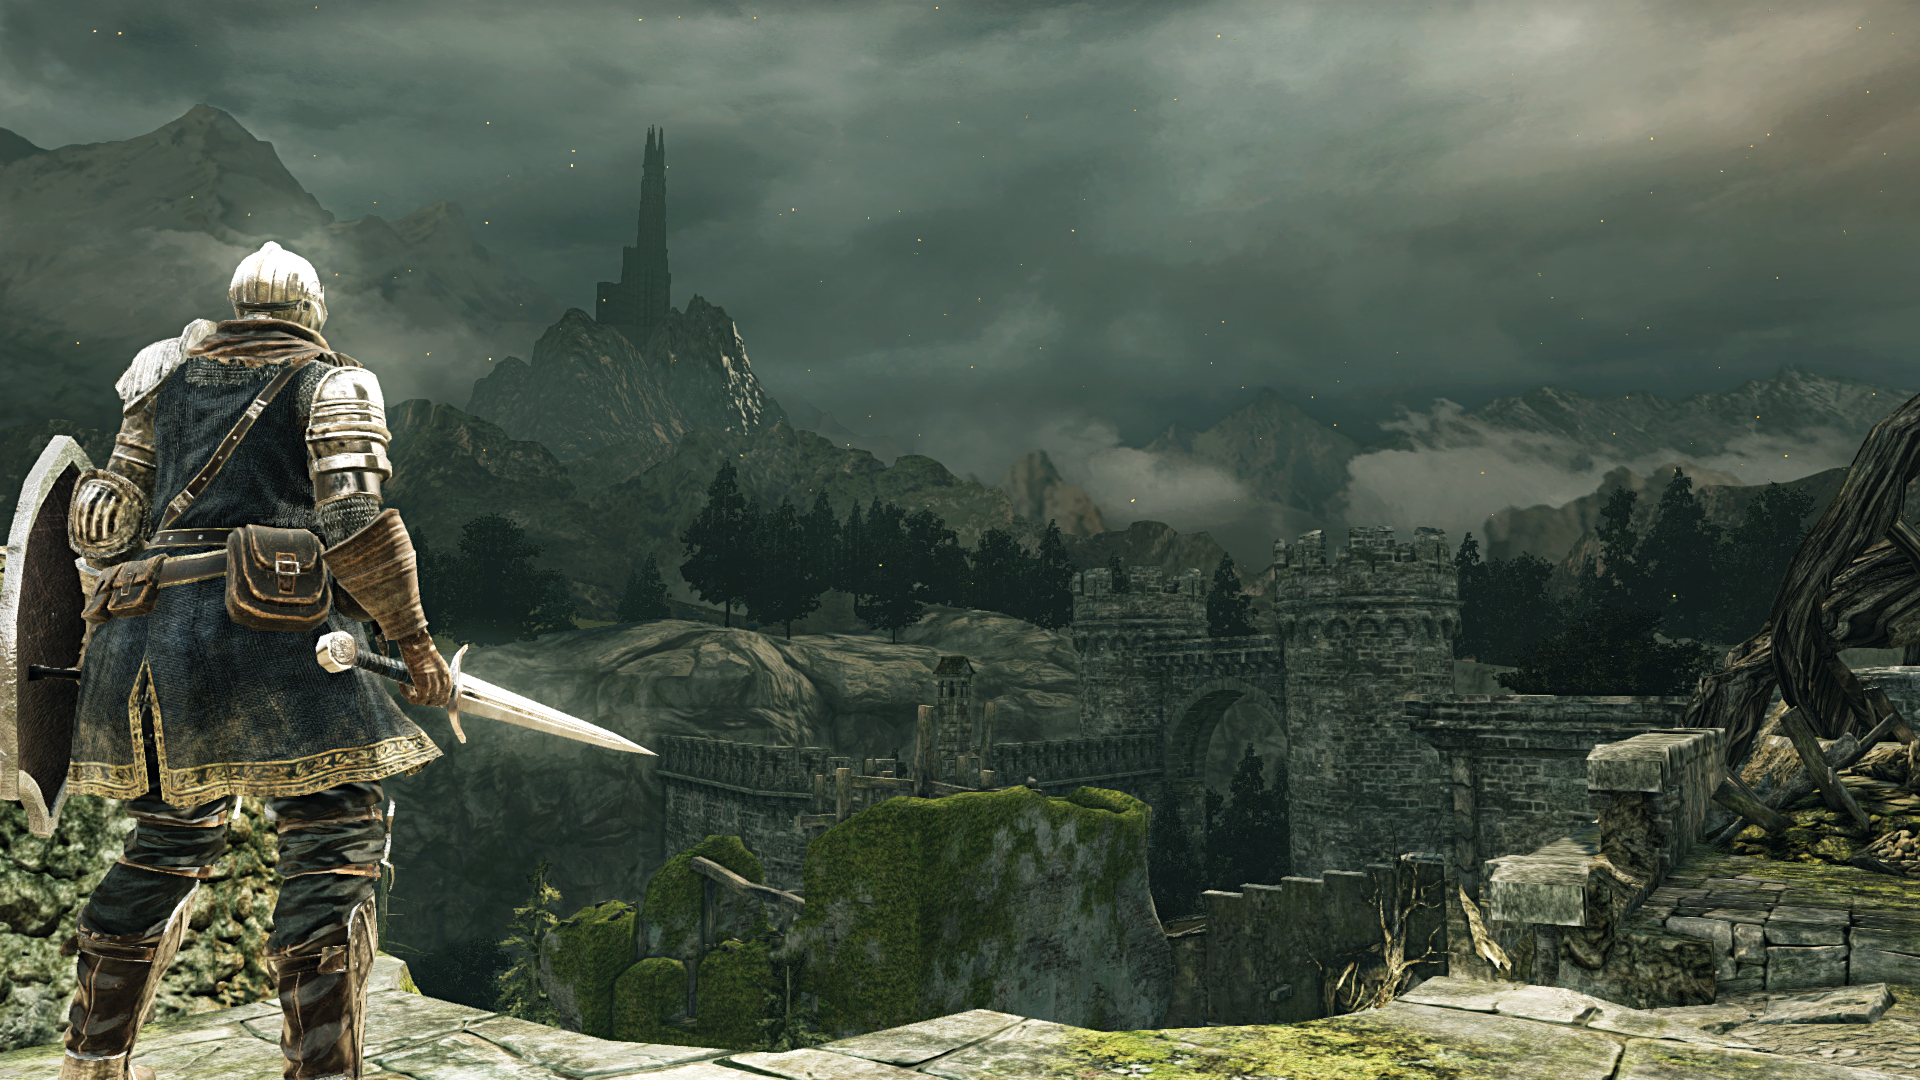 Obrazem: Temné dungeony, kostlivci a monstra z Dark Souls 2: Scholar of the First Sin 107568